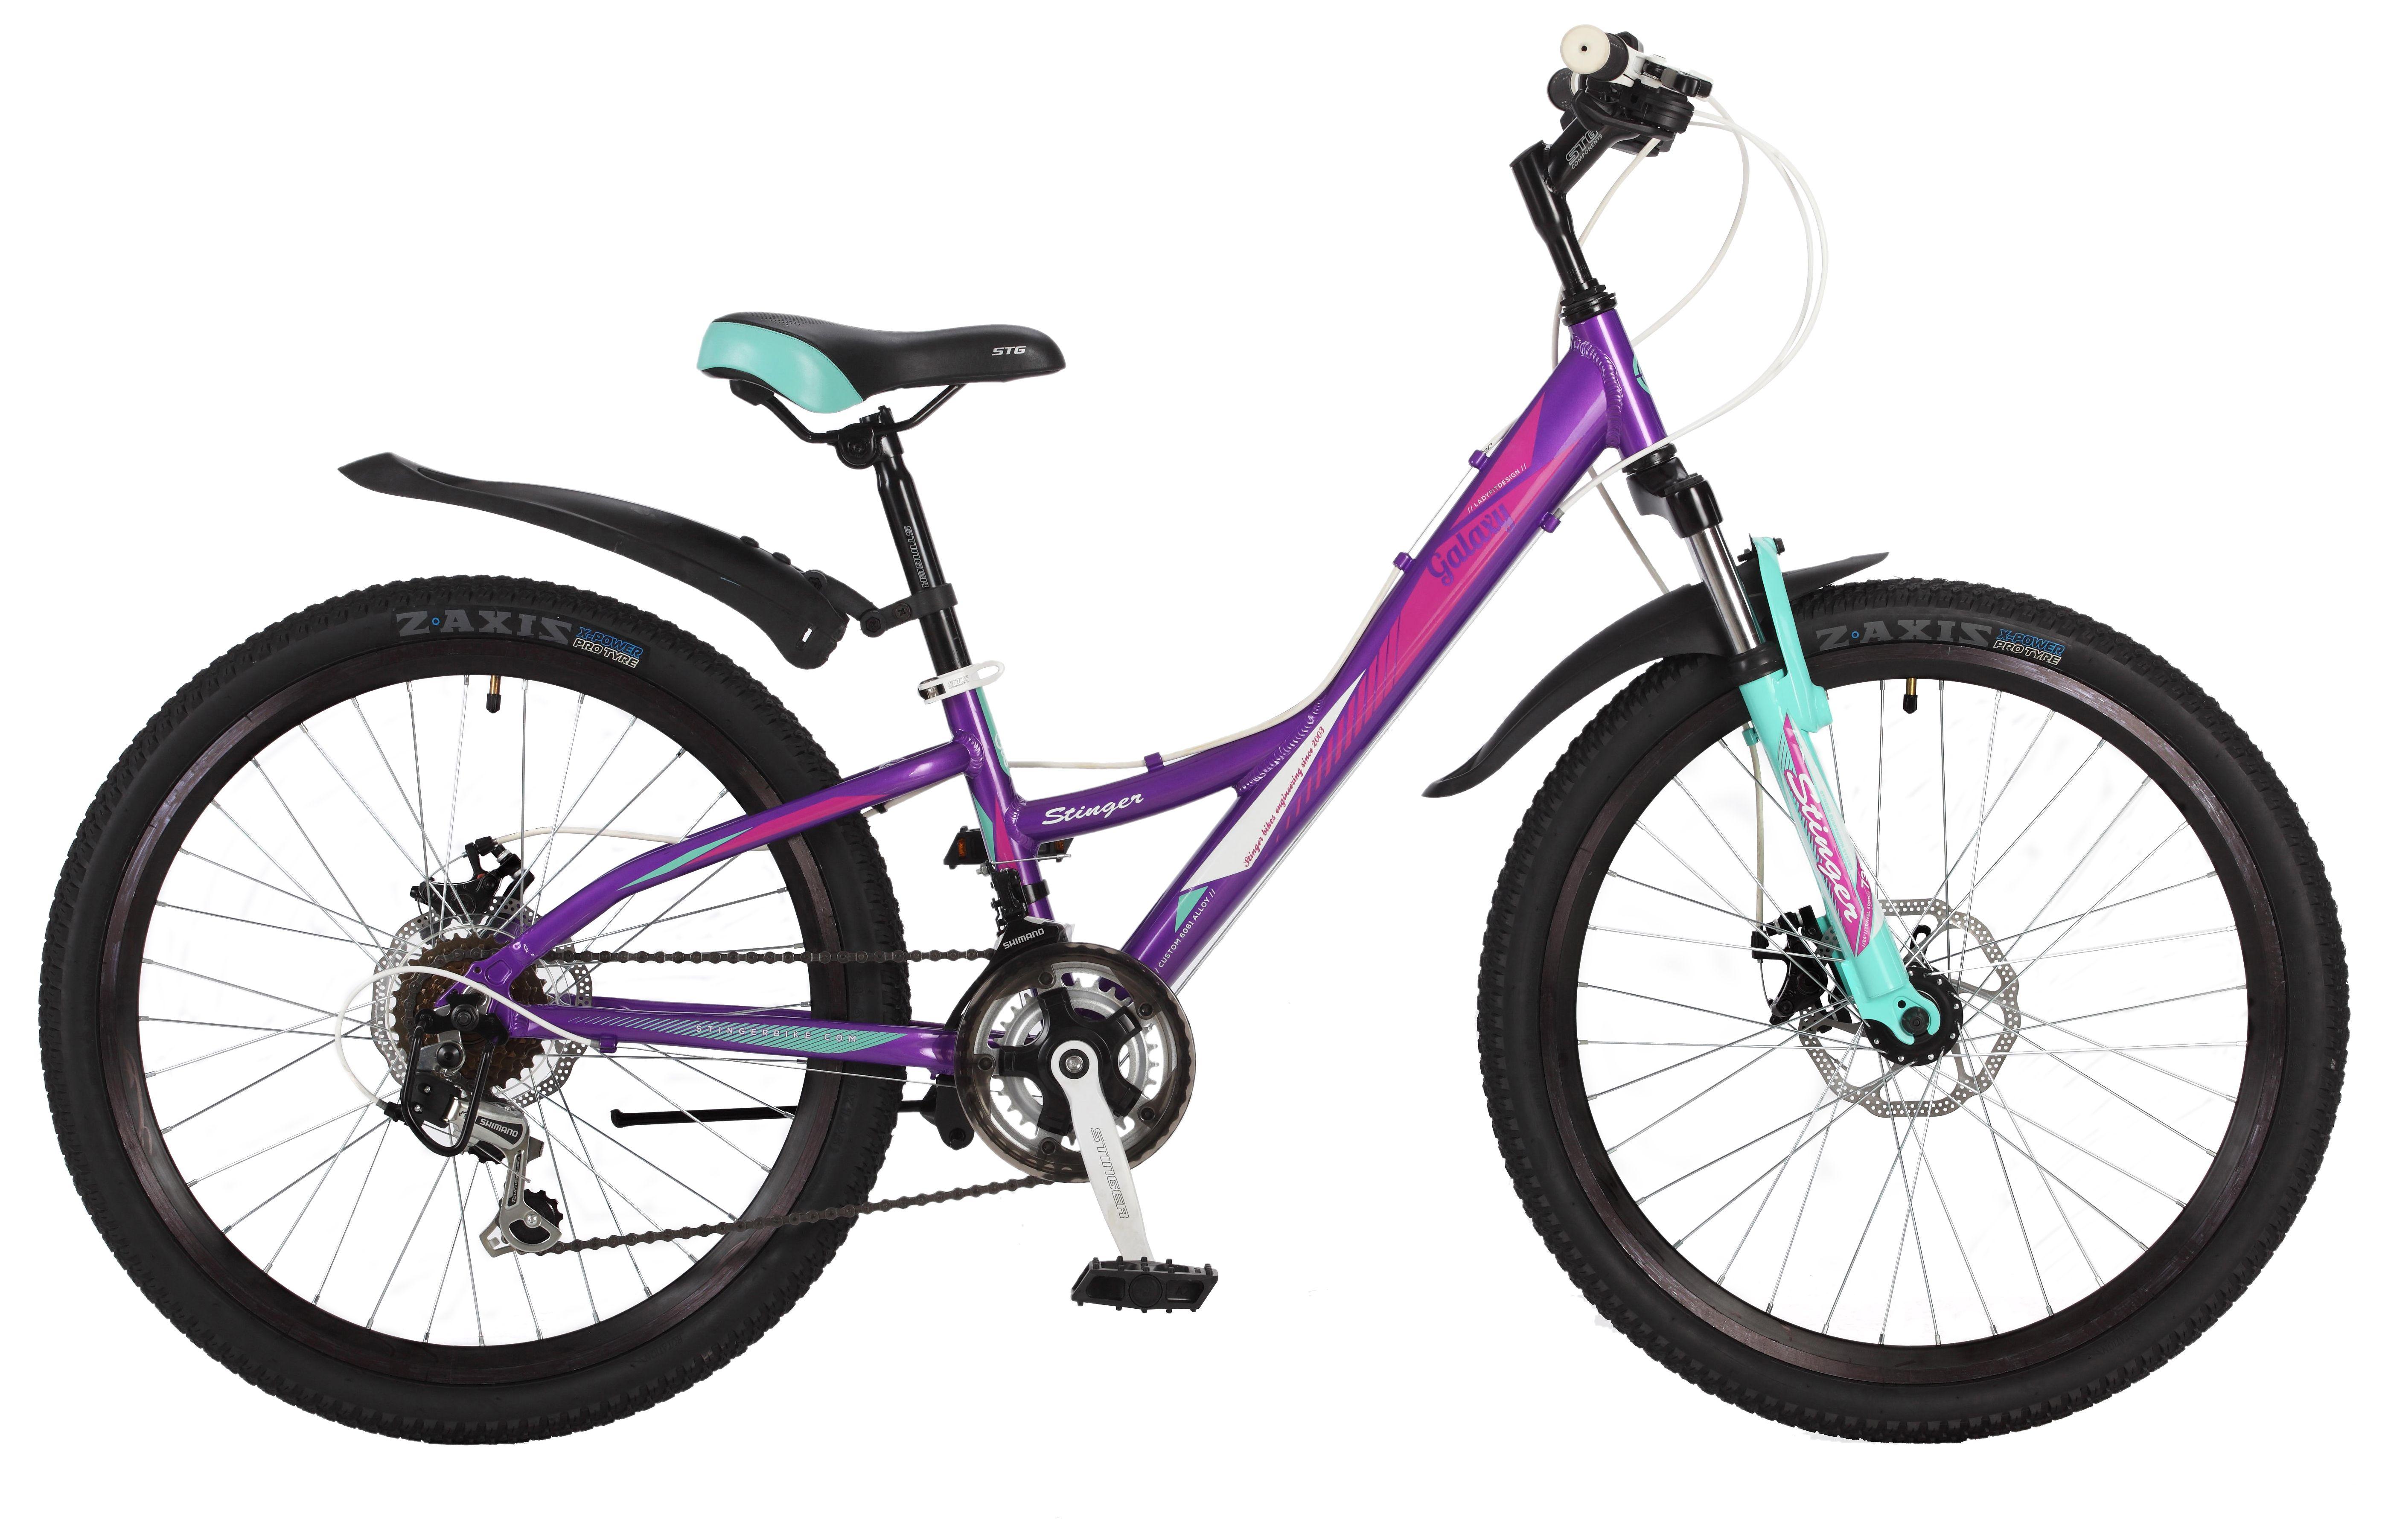 Велосипед Stinger Galaxy D 24 2017 велосипед stinger galaxy 24 2016